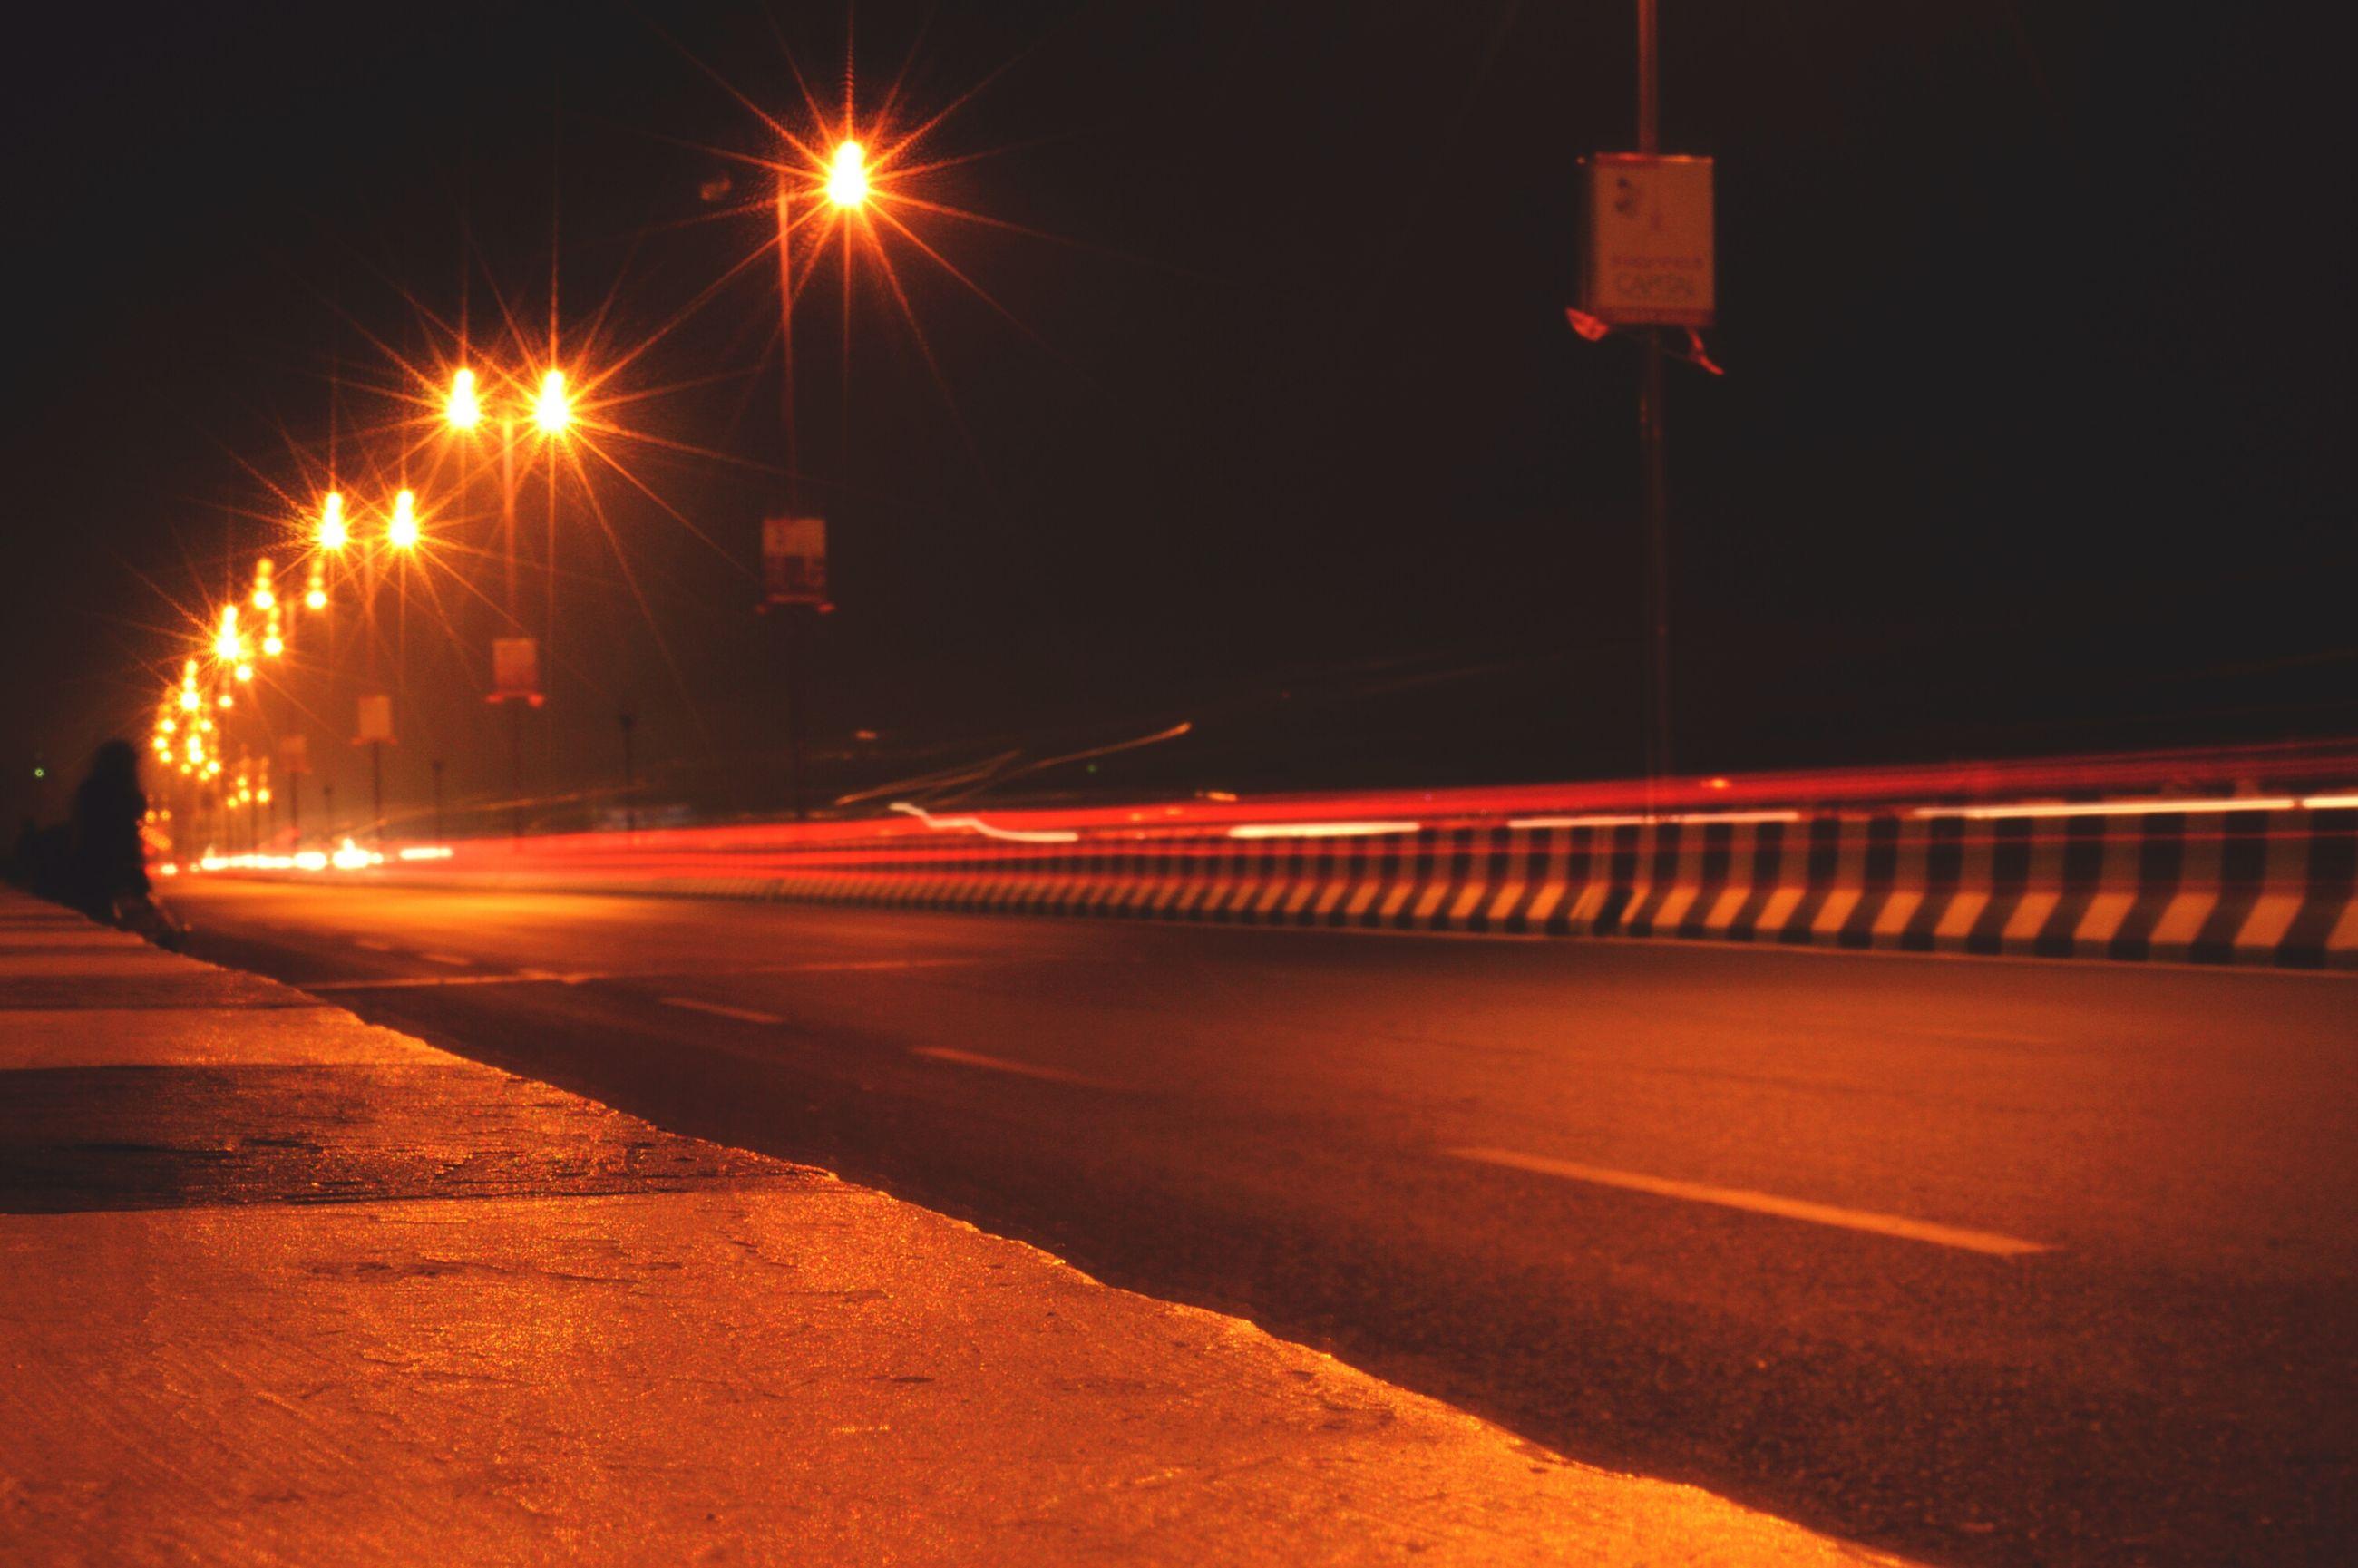 night, illuminated, long exposure, street light, no people, light trail, road, outdoors, architecture, high street, sky